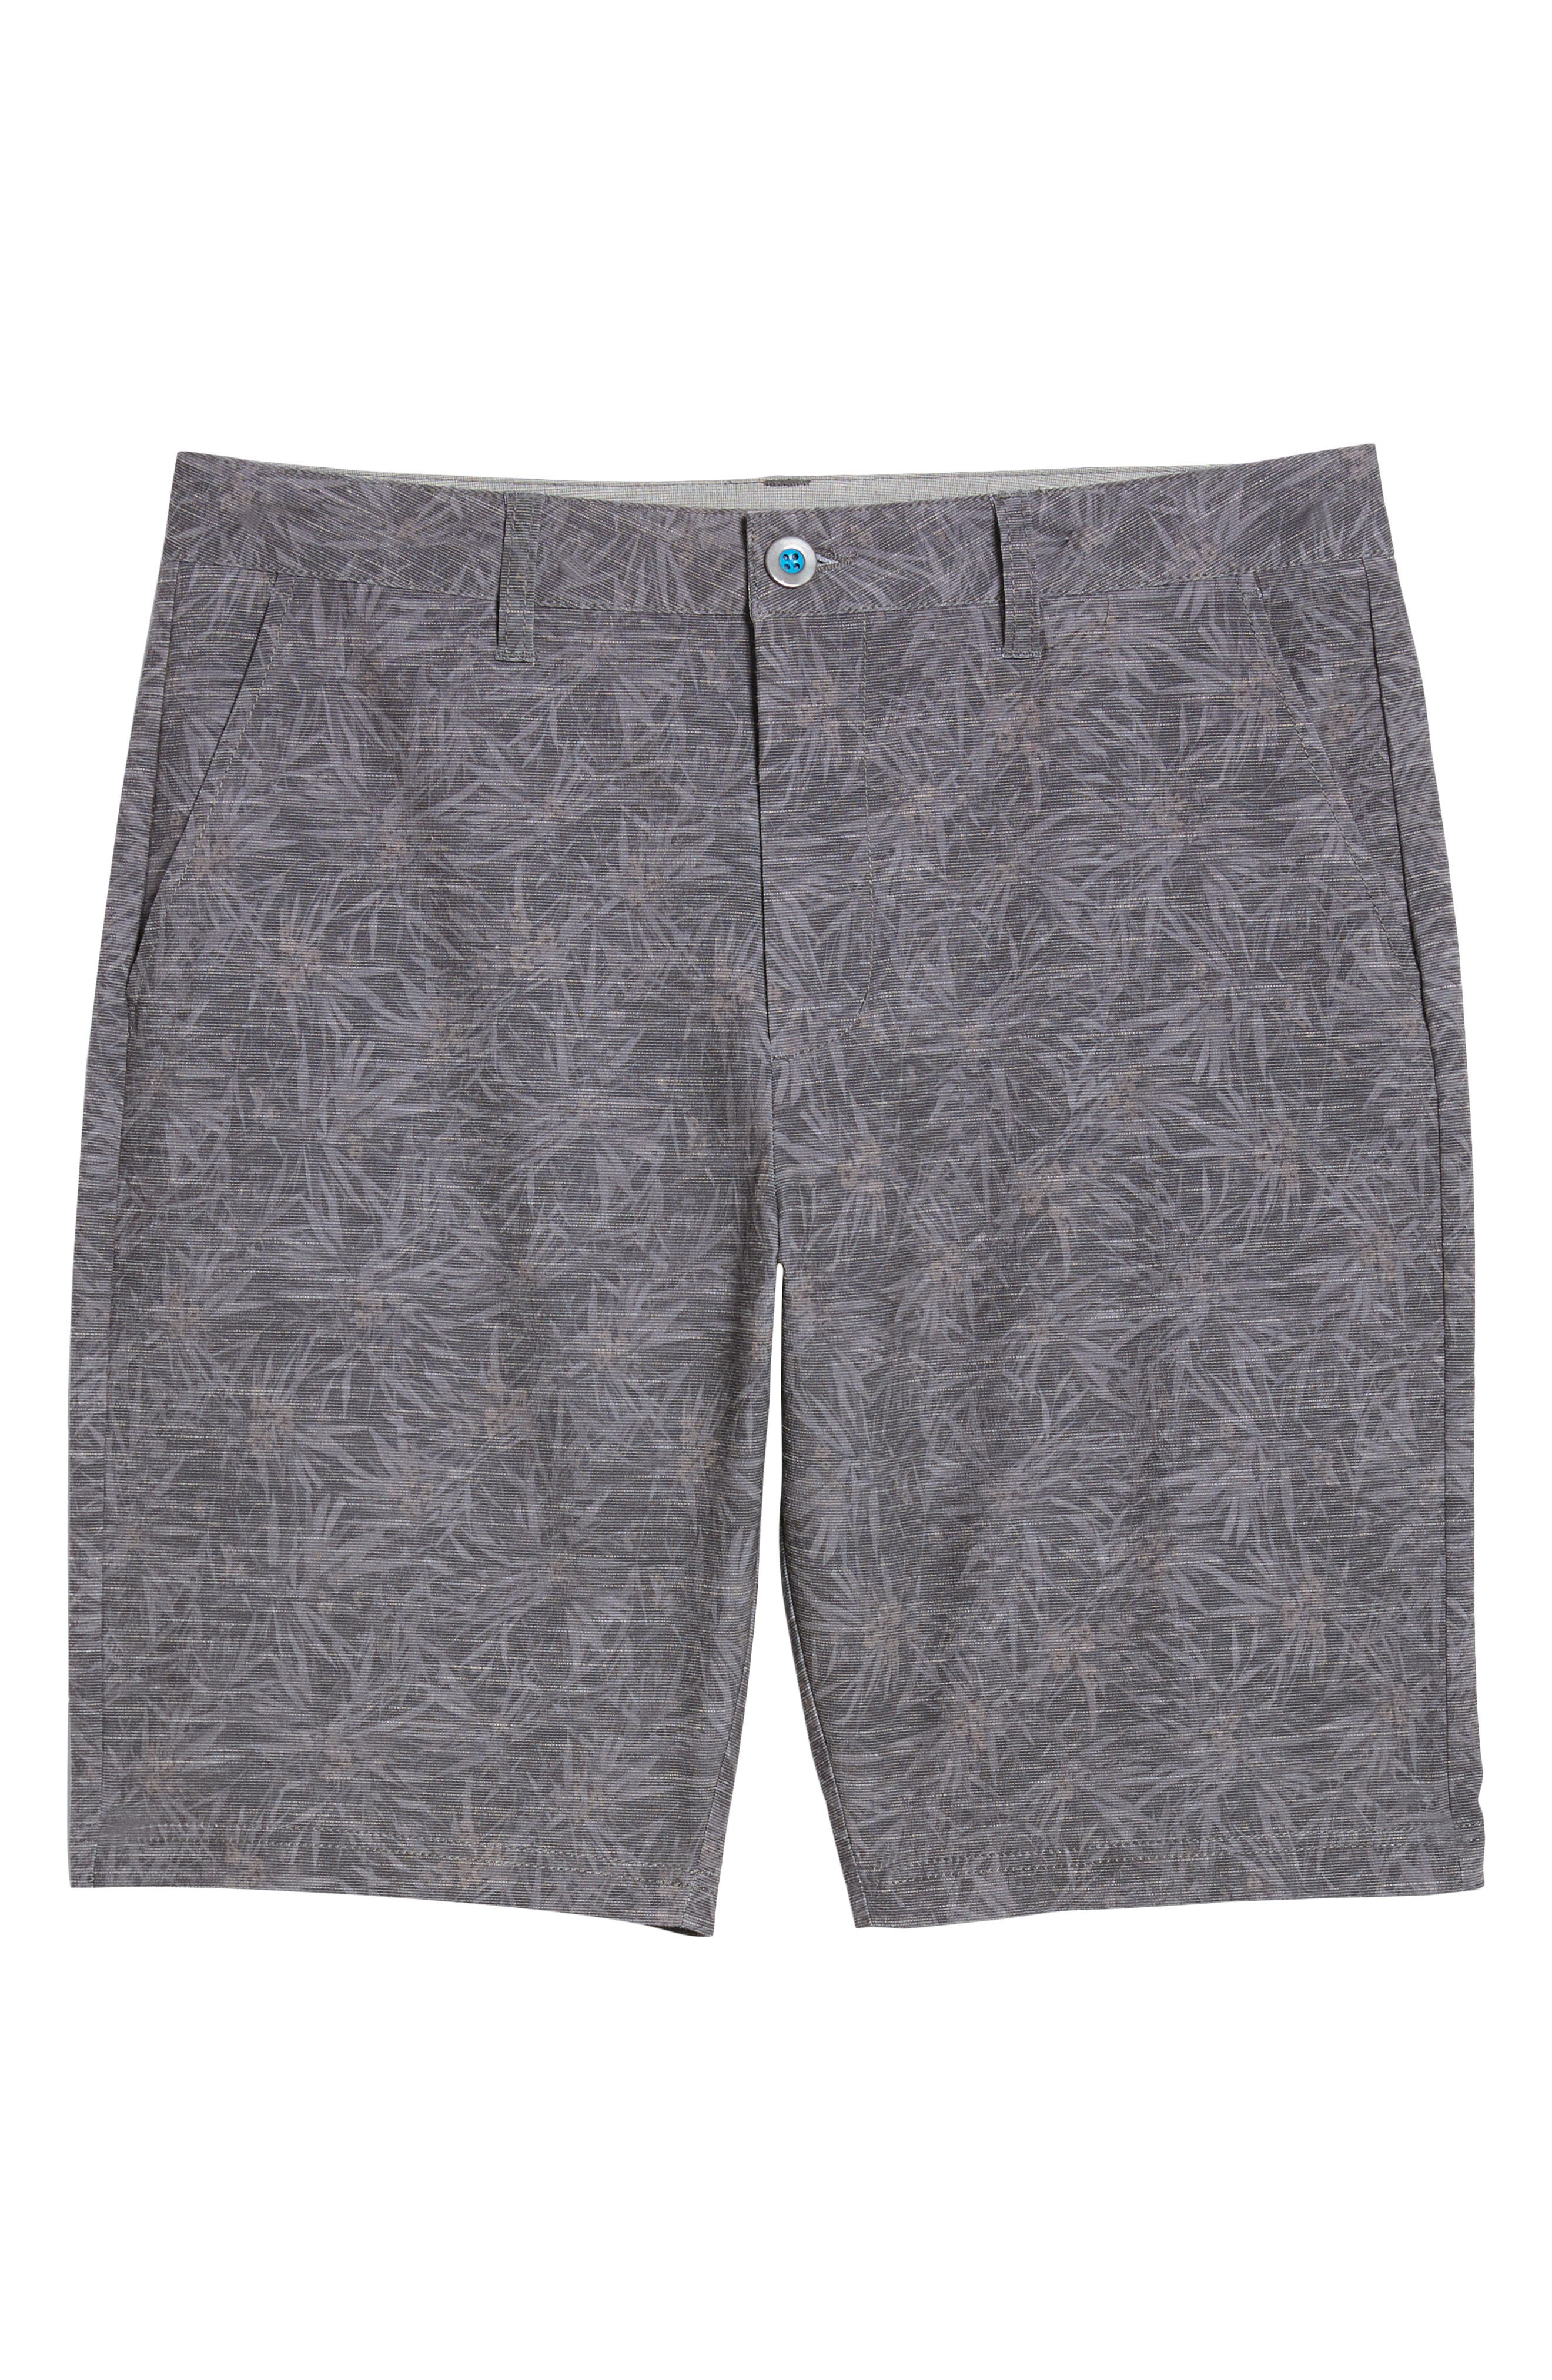 Cruiser Hybrid Shorts,                             Alternate thumbnail 6, color,                             Tropic Camo